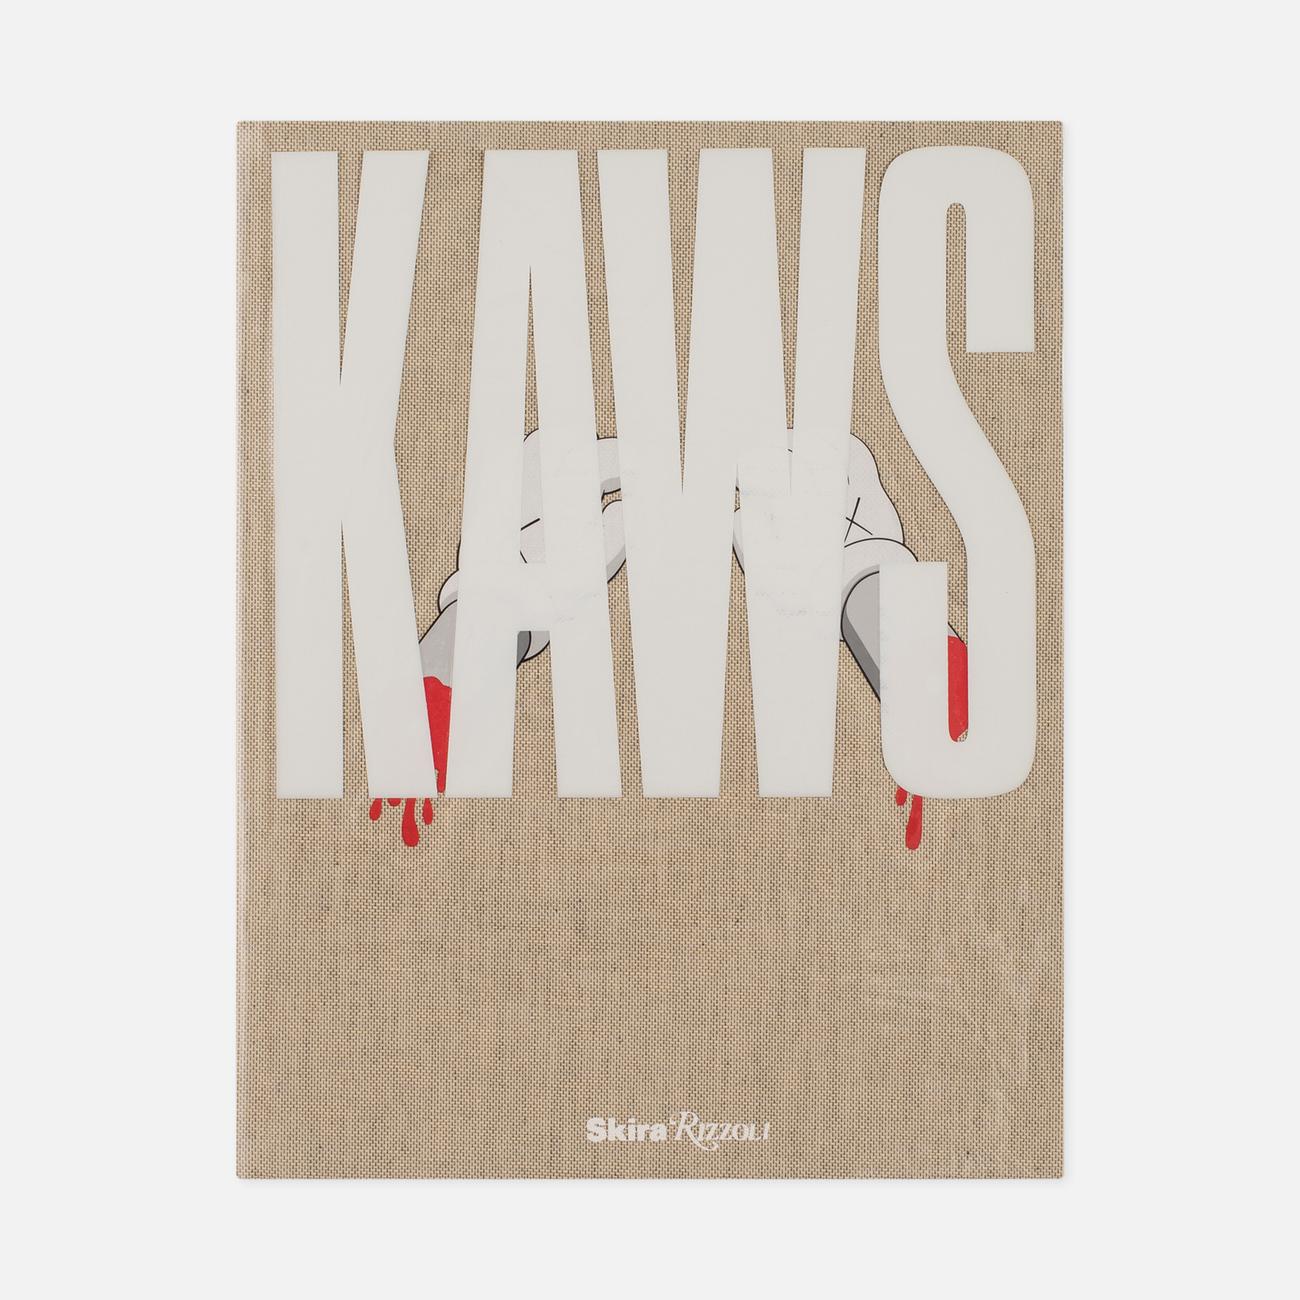 Книга Rizzoli Kaws 256 pgs